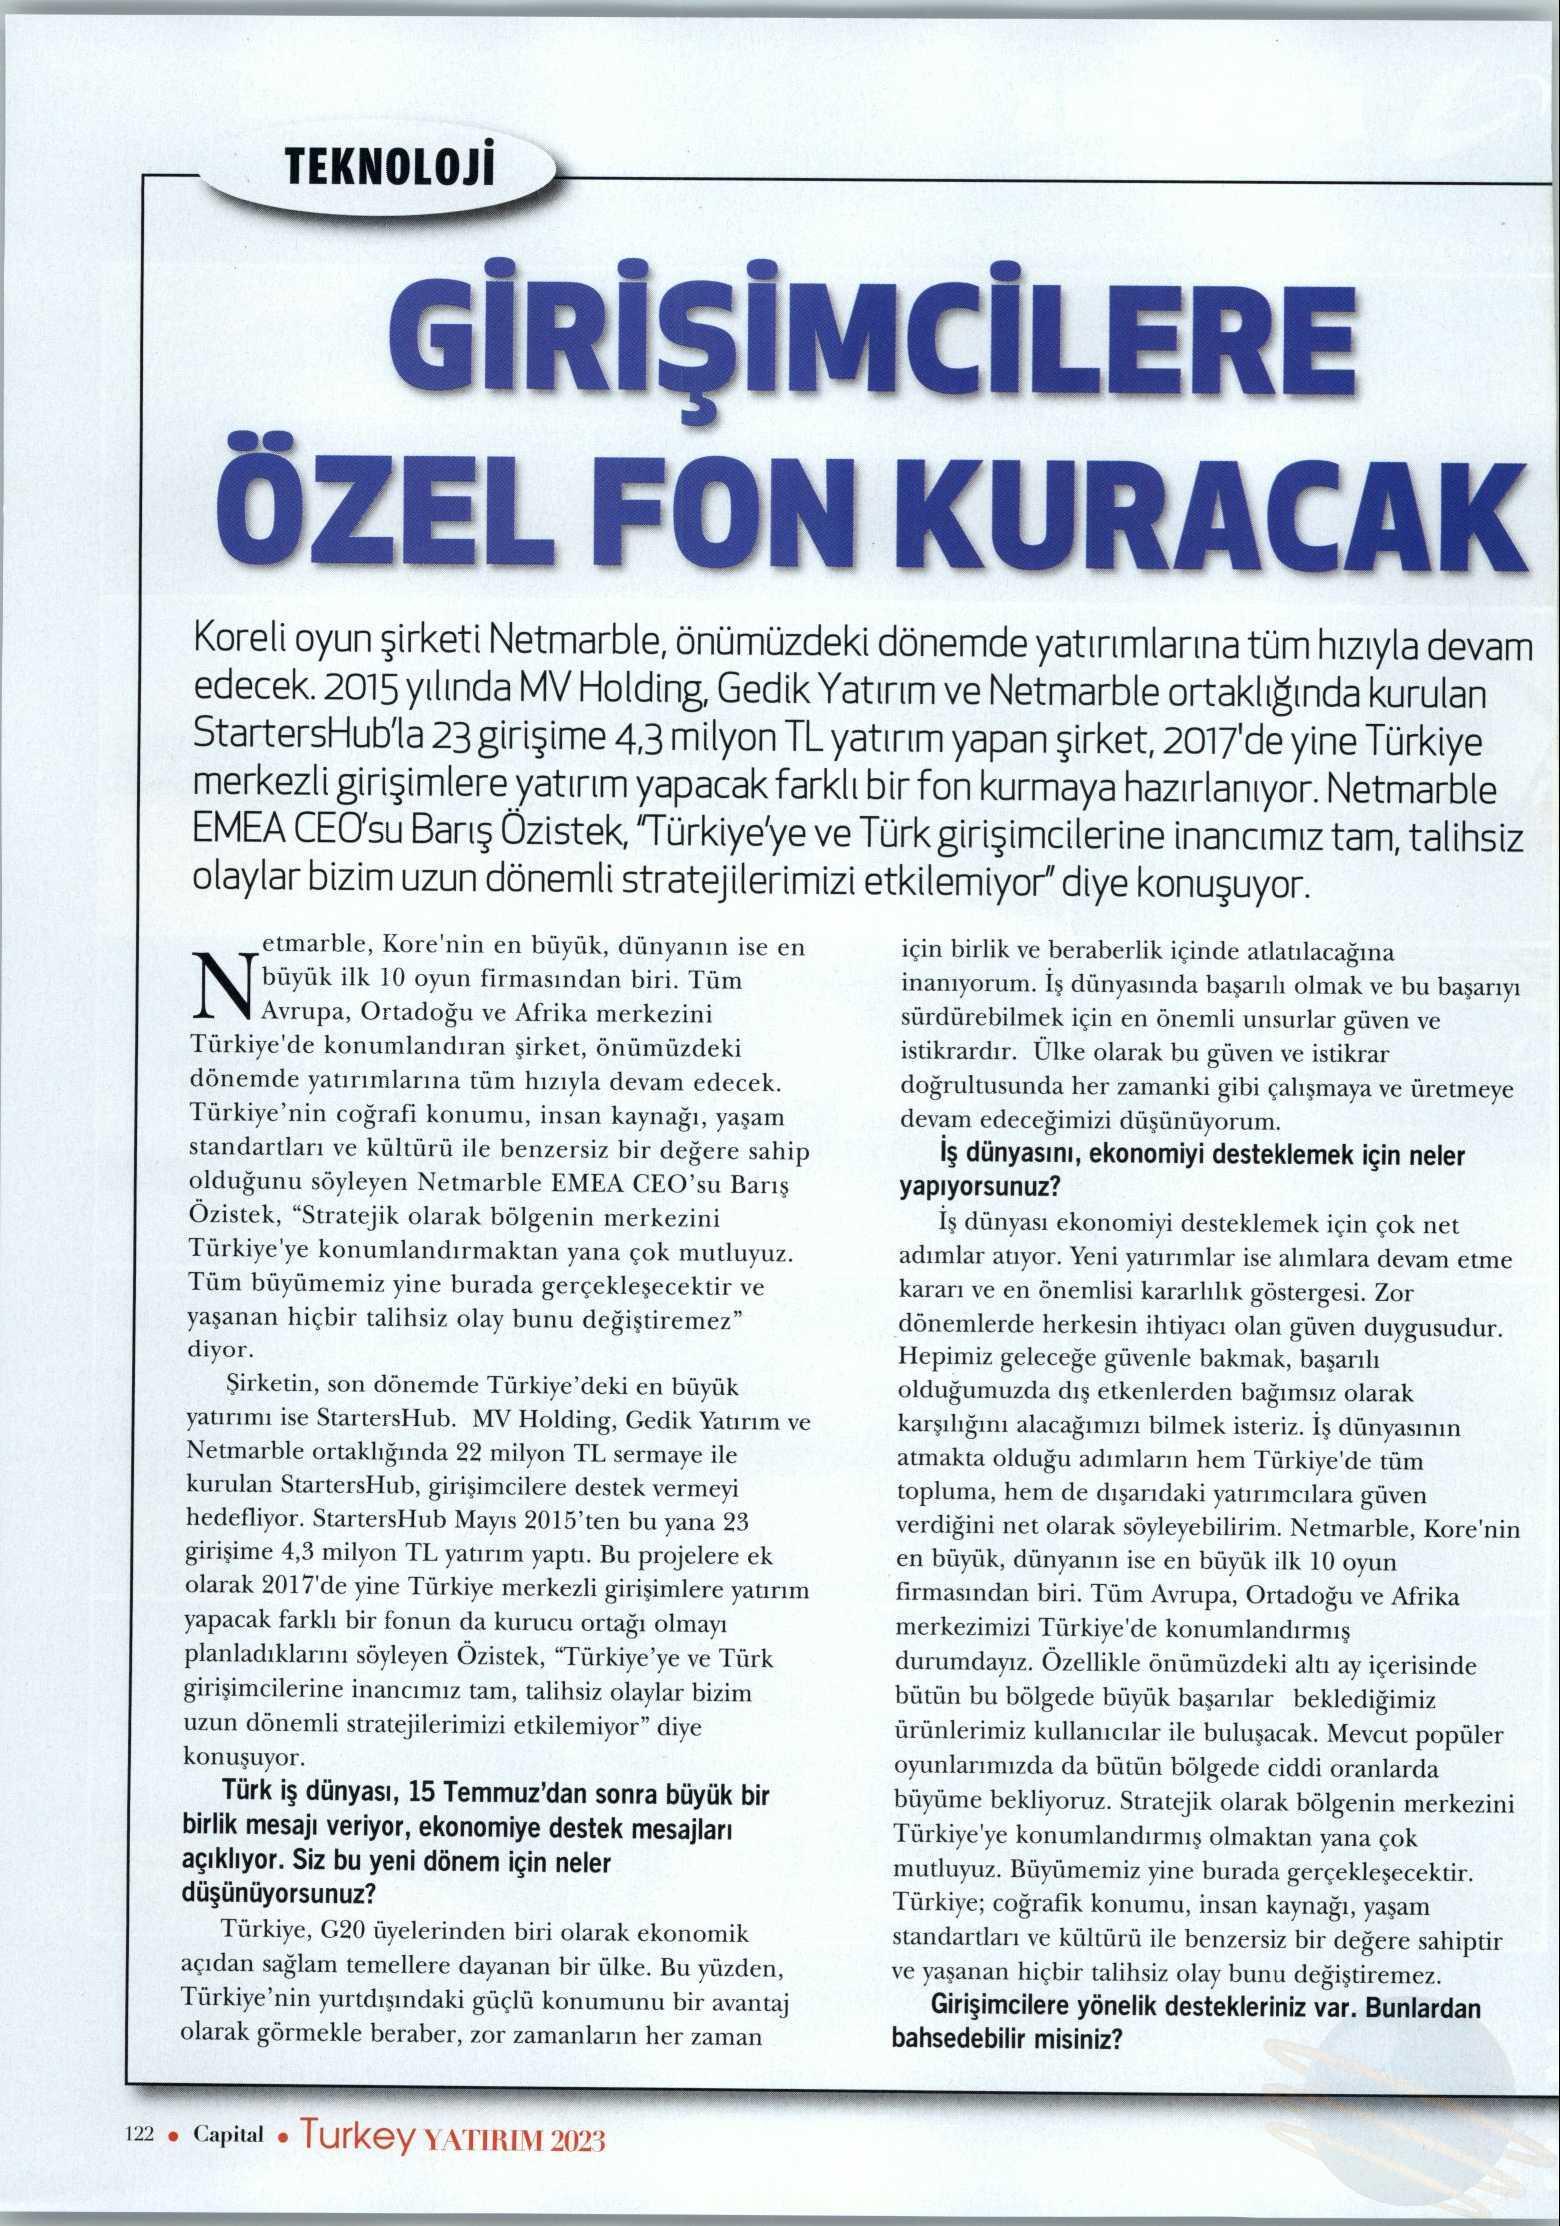 0902_CapitalEk_BarışÖzistek_1